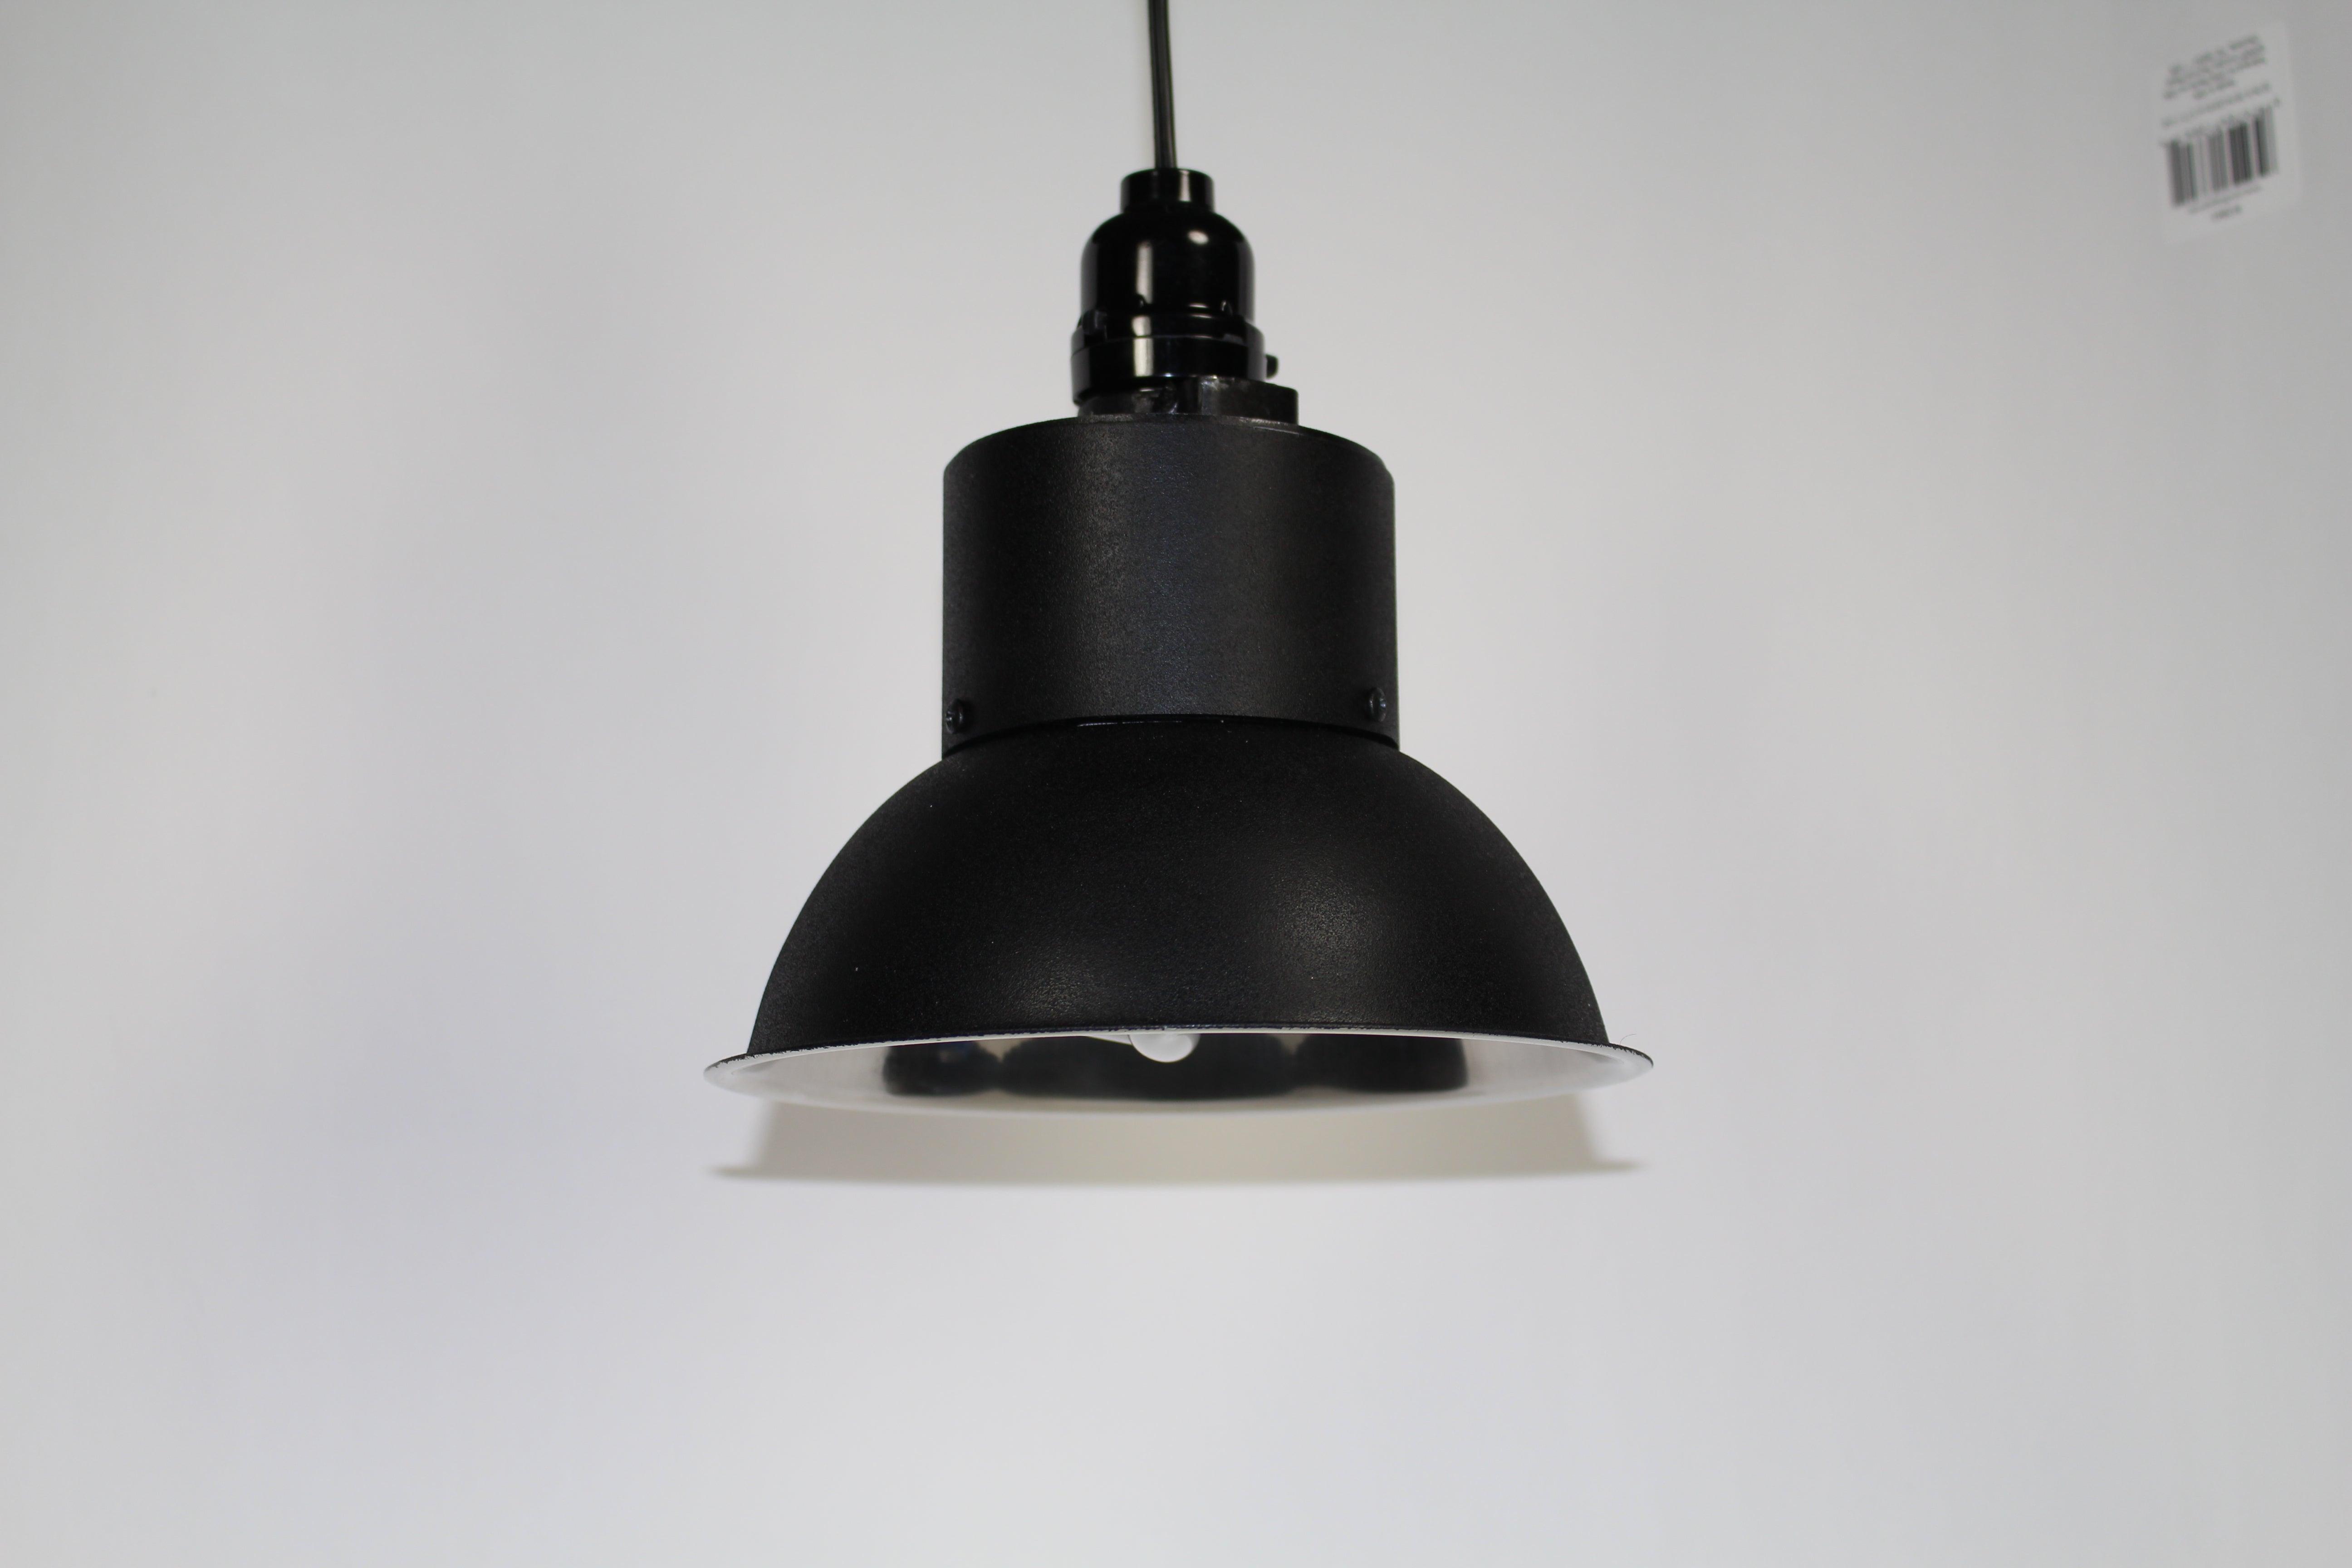 Dirt Cheap DIY CFL Reflector : 5 Steps - Instructables